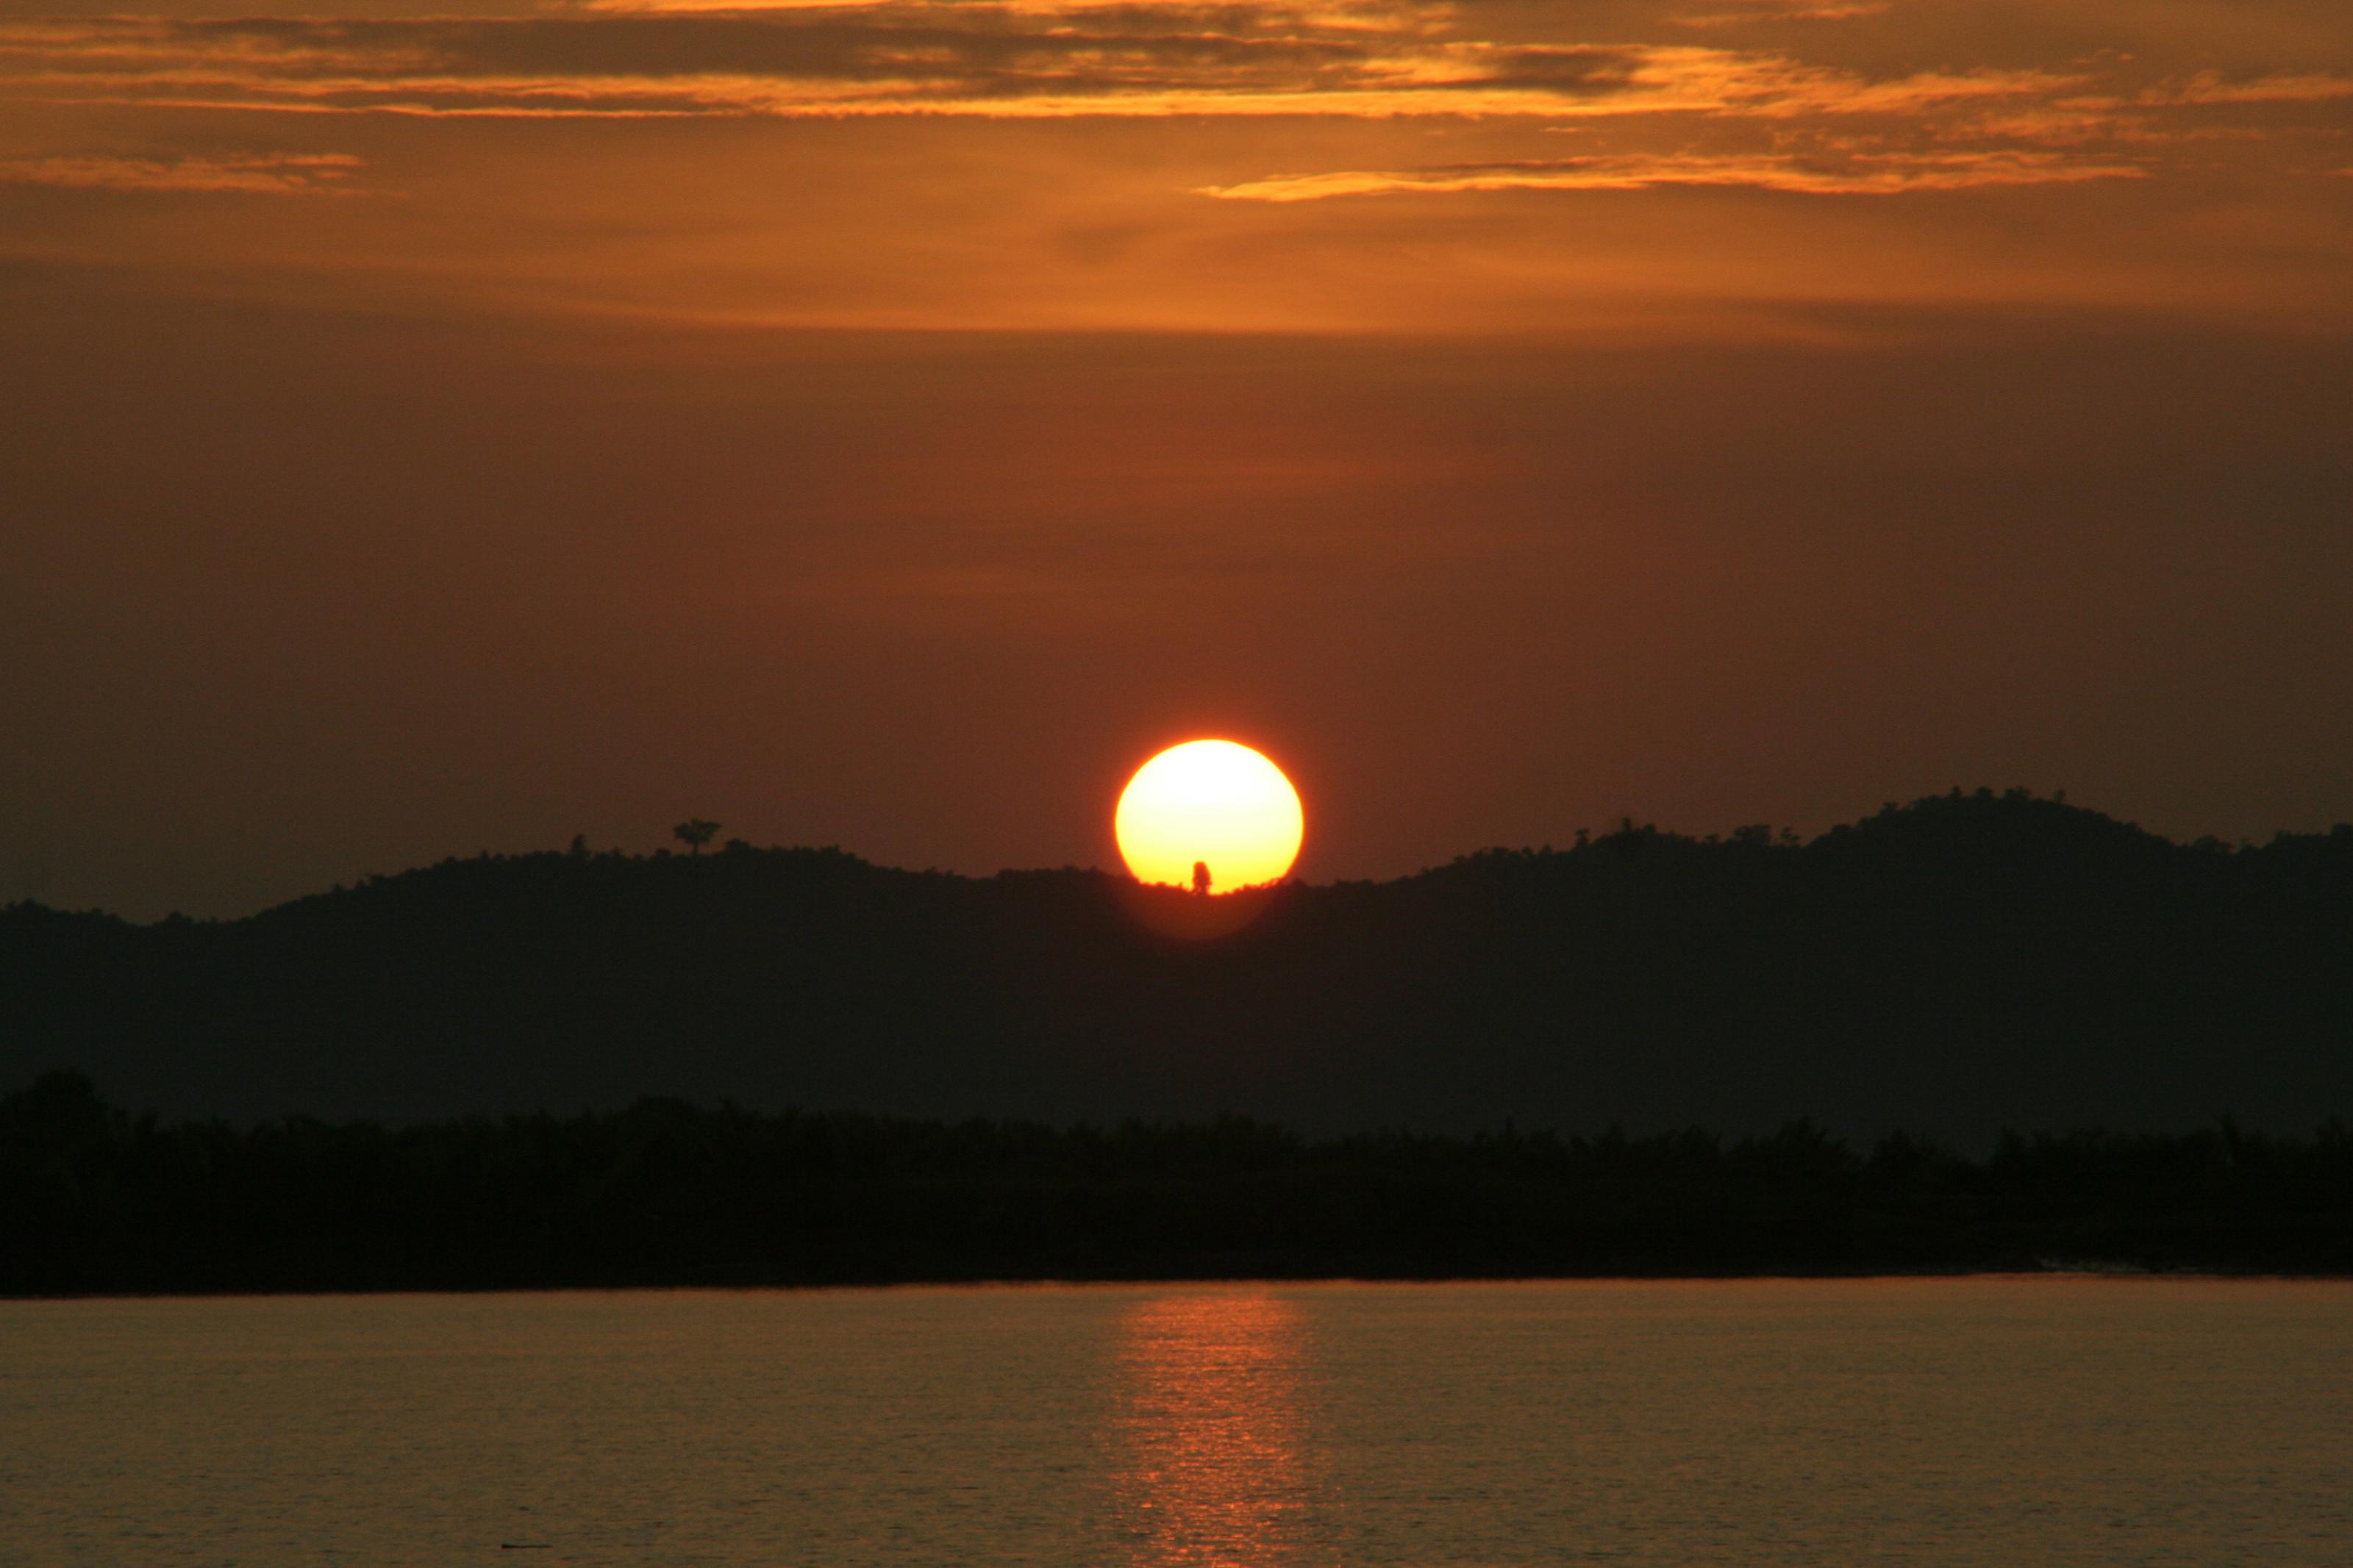 Mrauk U - sunset